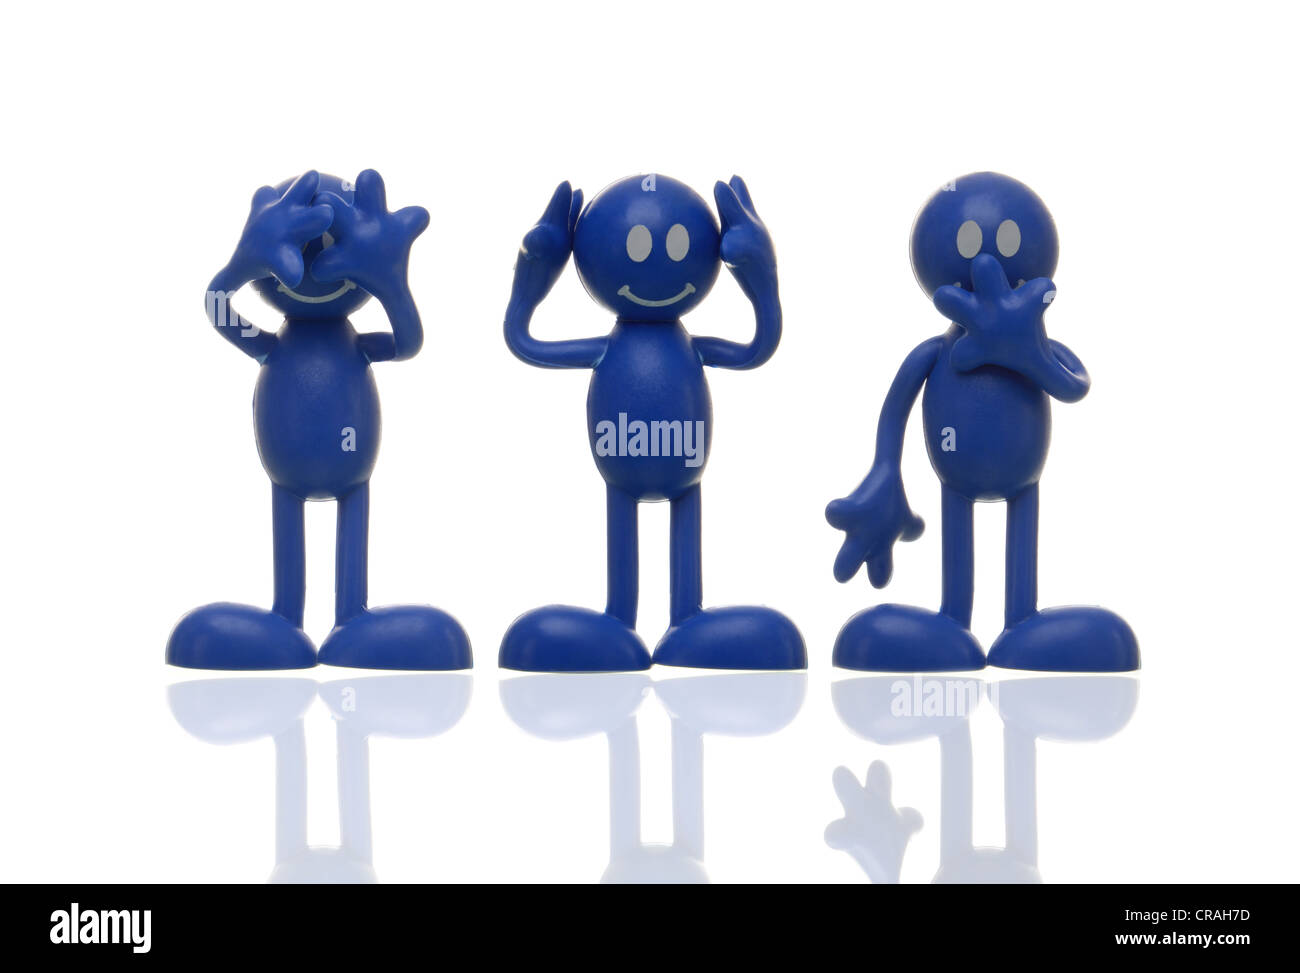 Blue figures hearing nothing, seeing nothing, saying nothing, blind, deaf, silent, symbolic image - Stock Image